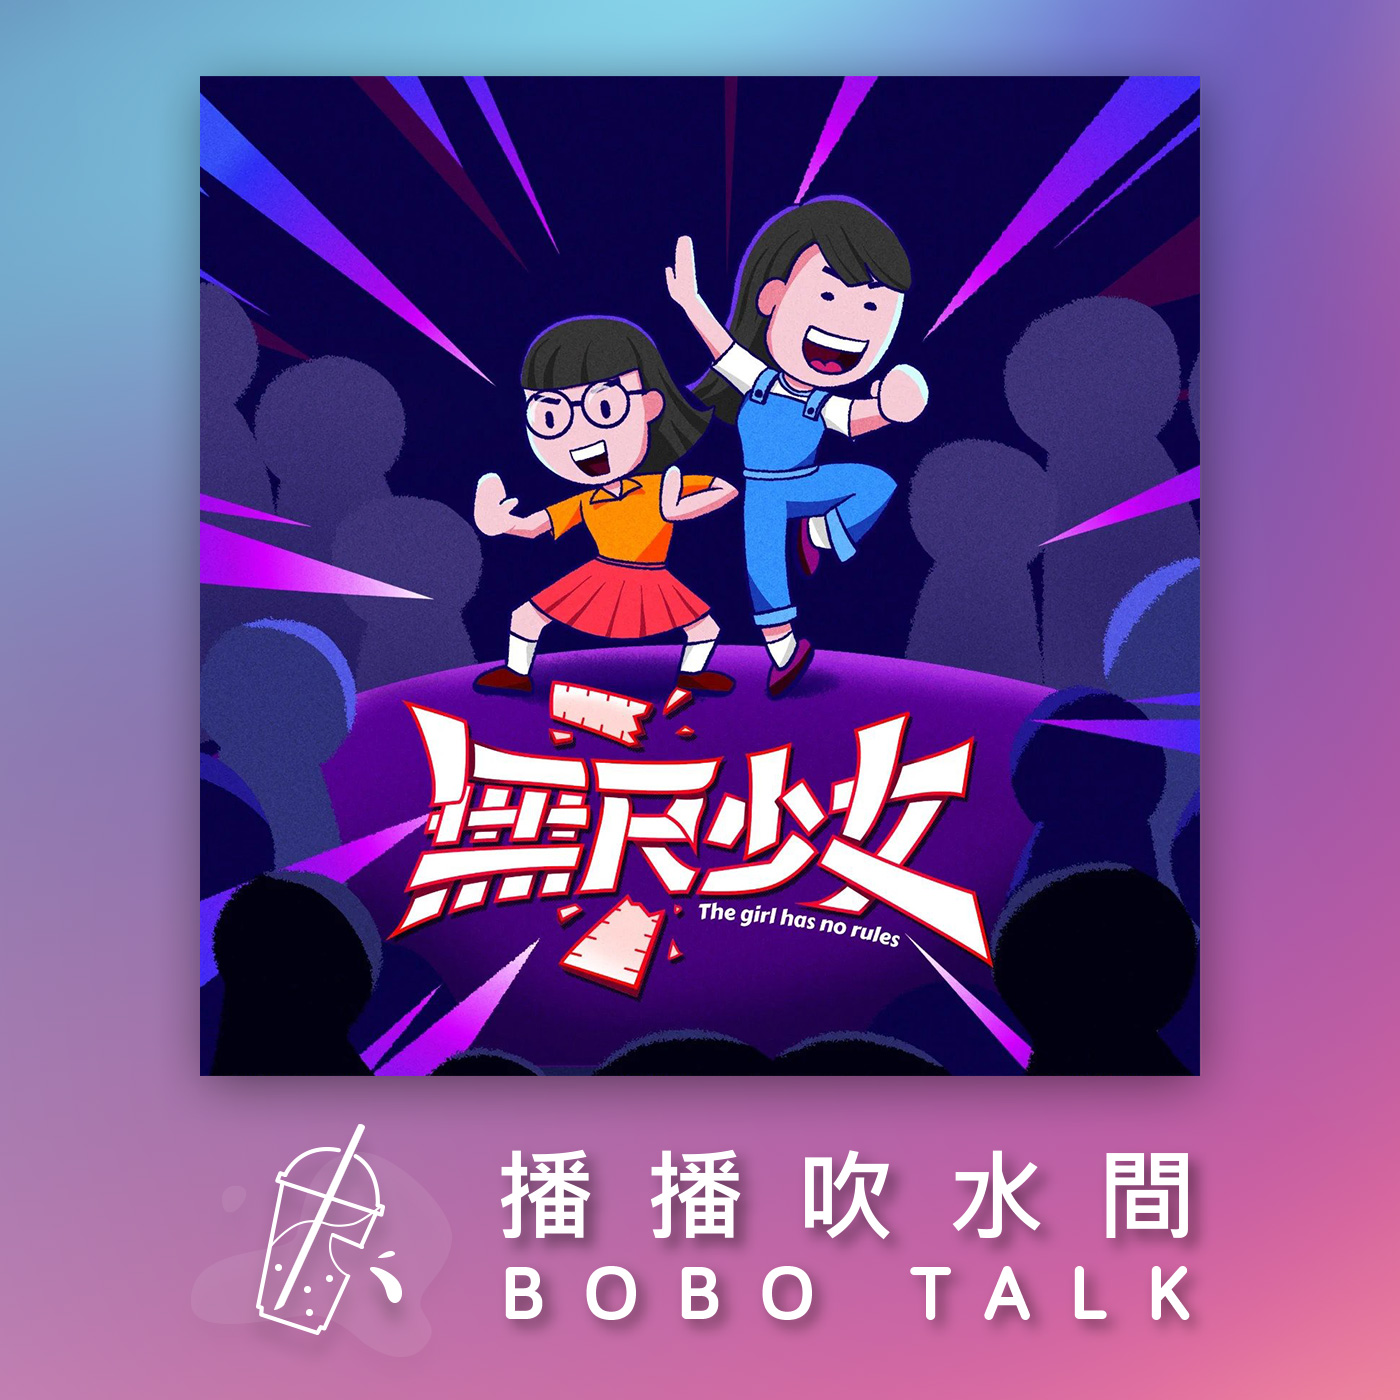 EP33 -《Jio你來吹水 ft. 無尺少女》兩個小時的大大爆料!